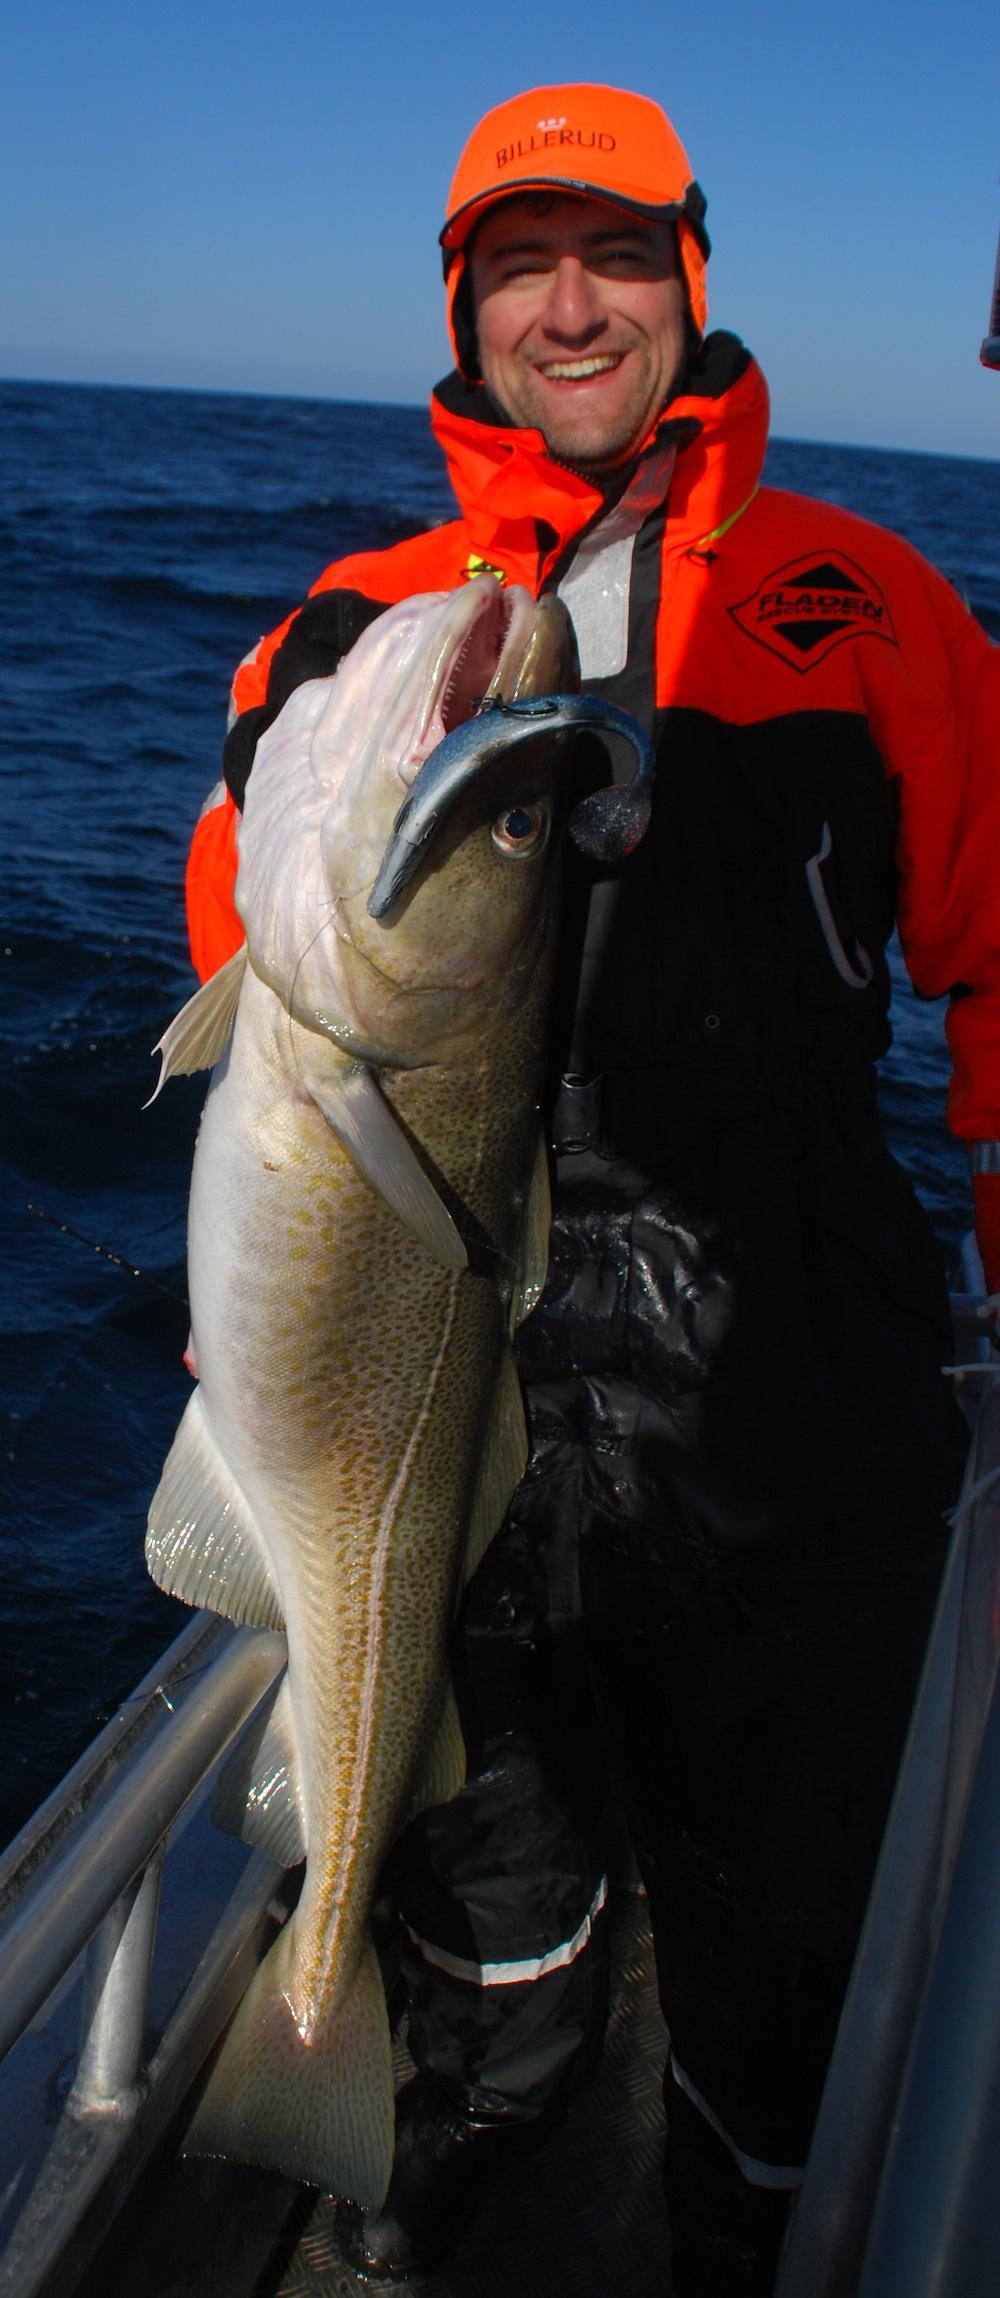 Rafael med torsk fanget på SG 3d herring shad